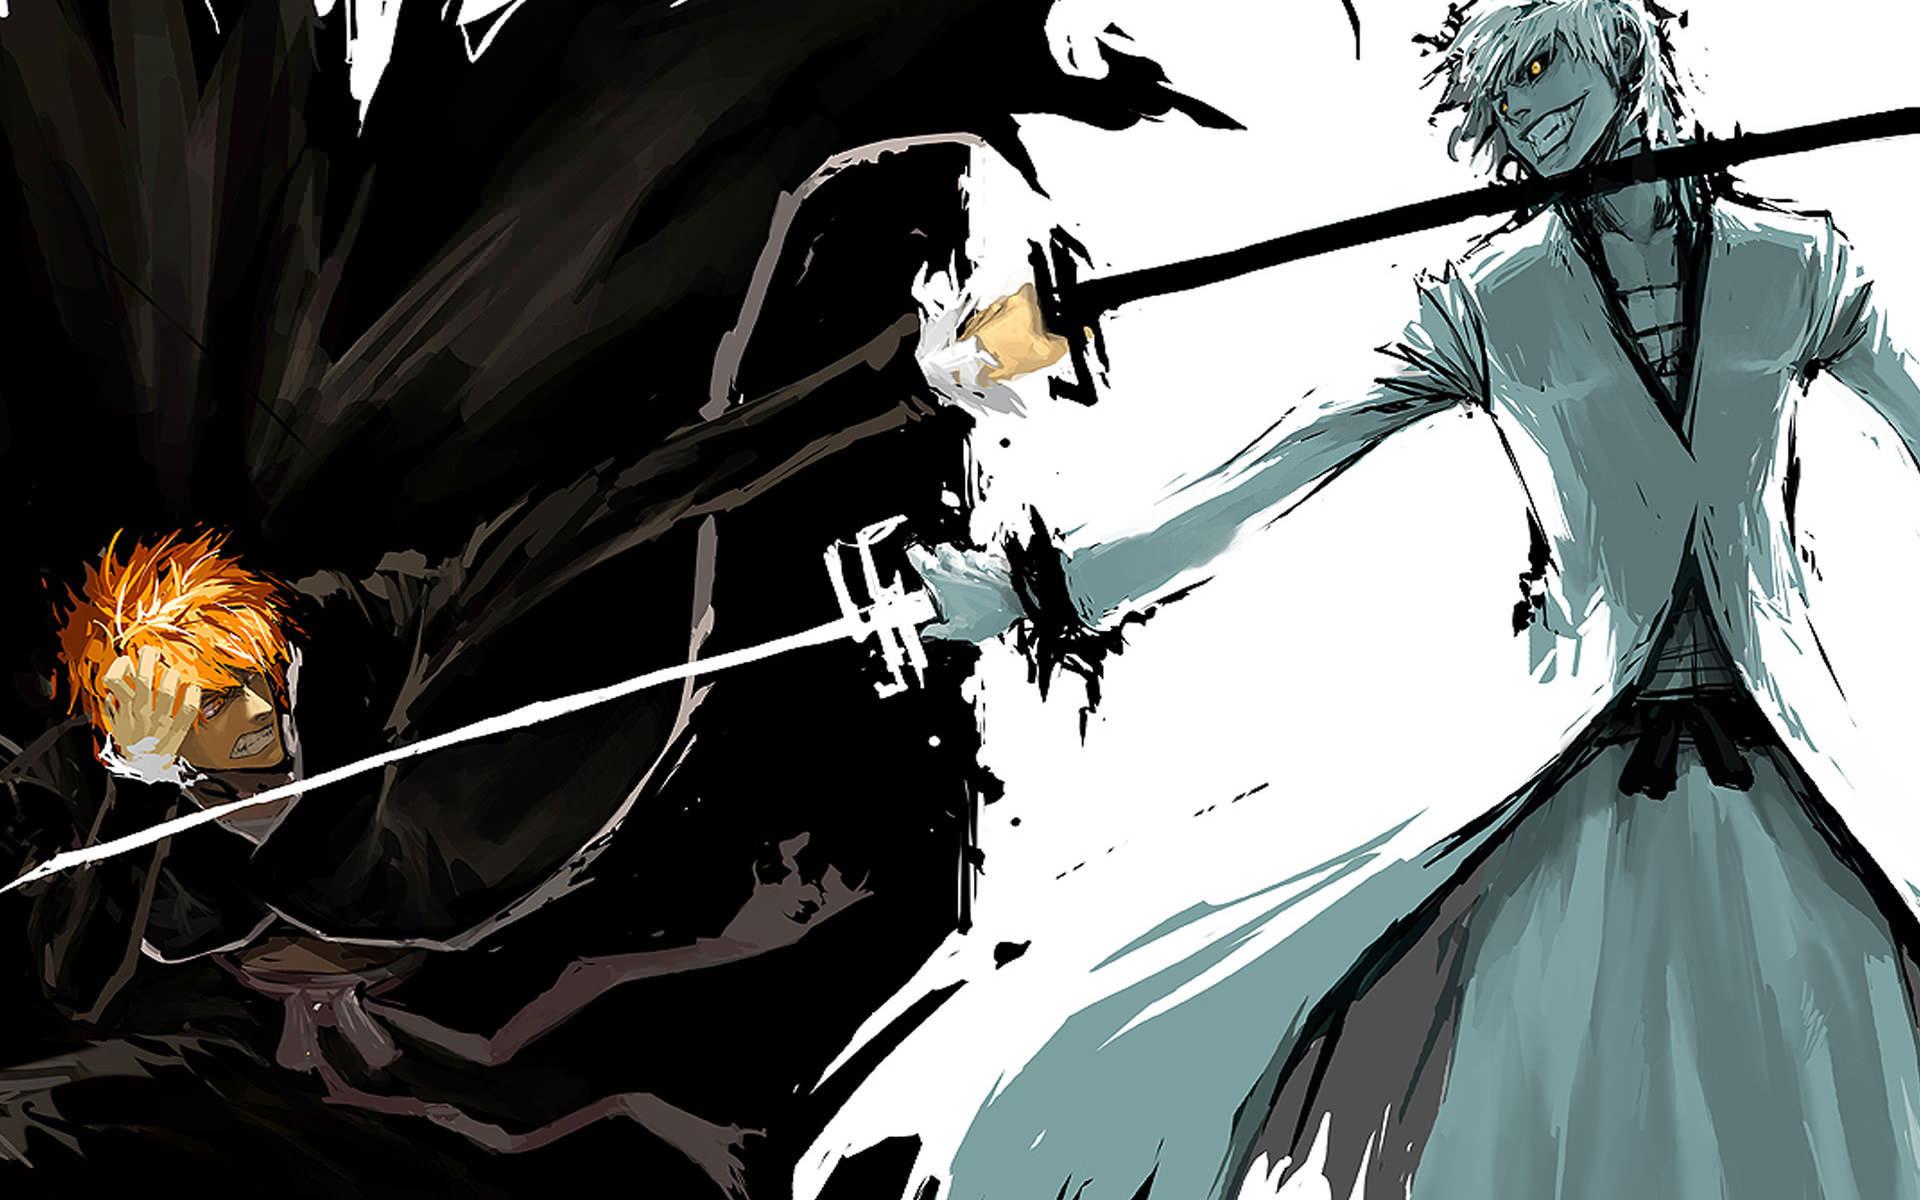 100 Wallpapers de anime HD Anime-death-note-wallpaper-1920x1200-1001040